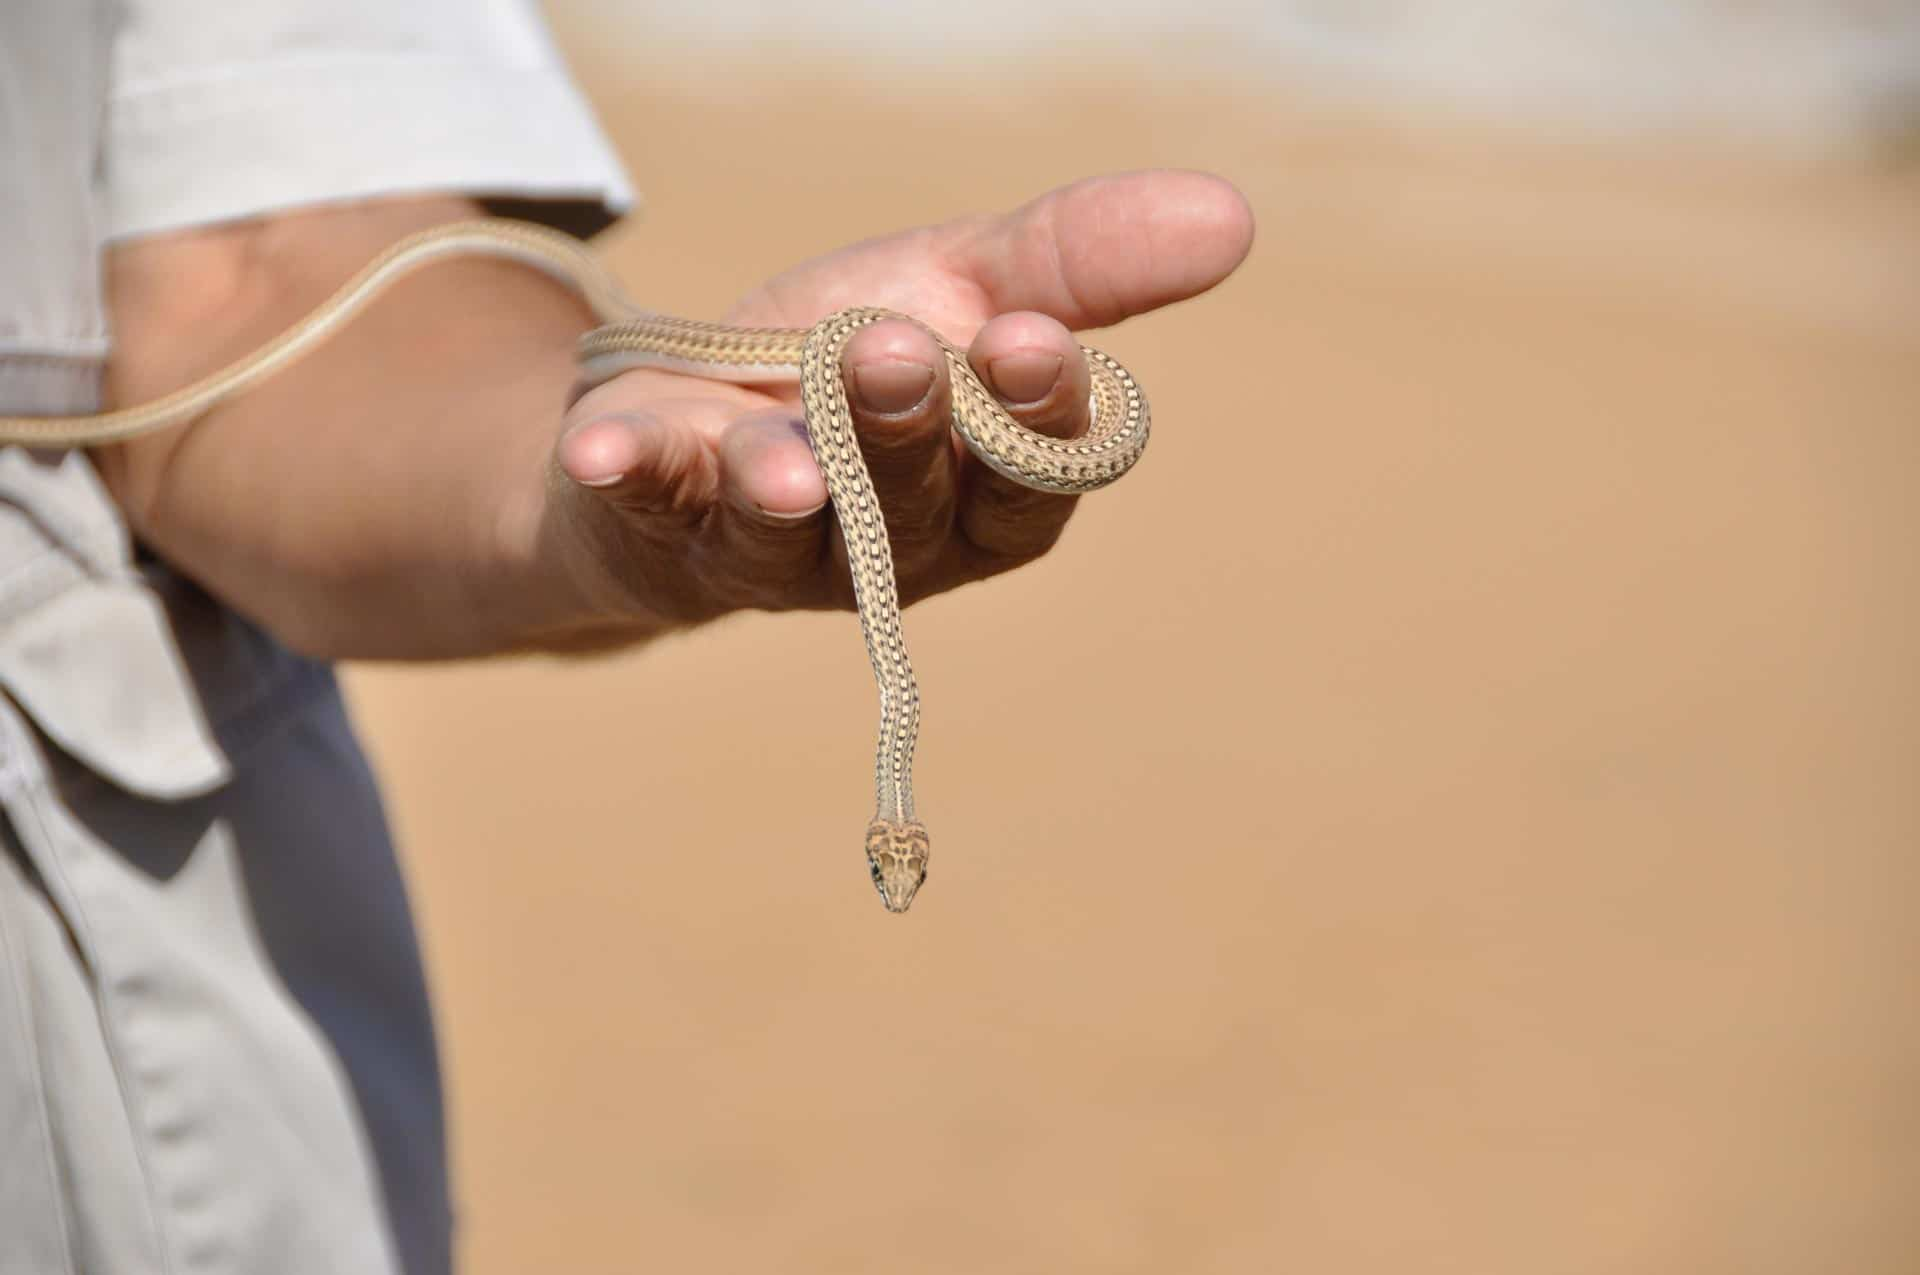 Living-Desert-Tour-Swakopmund-Namibia-Globetrotter-Select-14